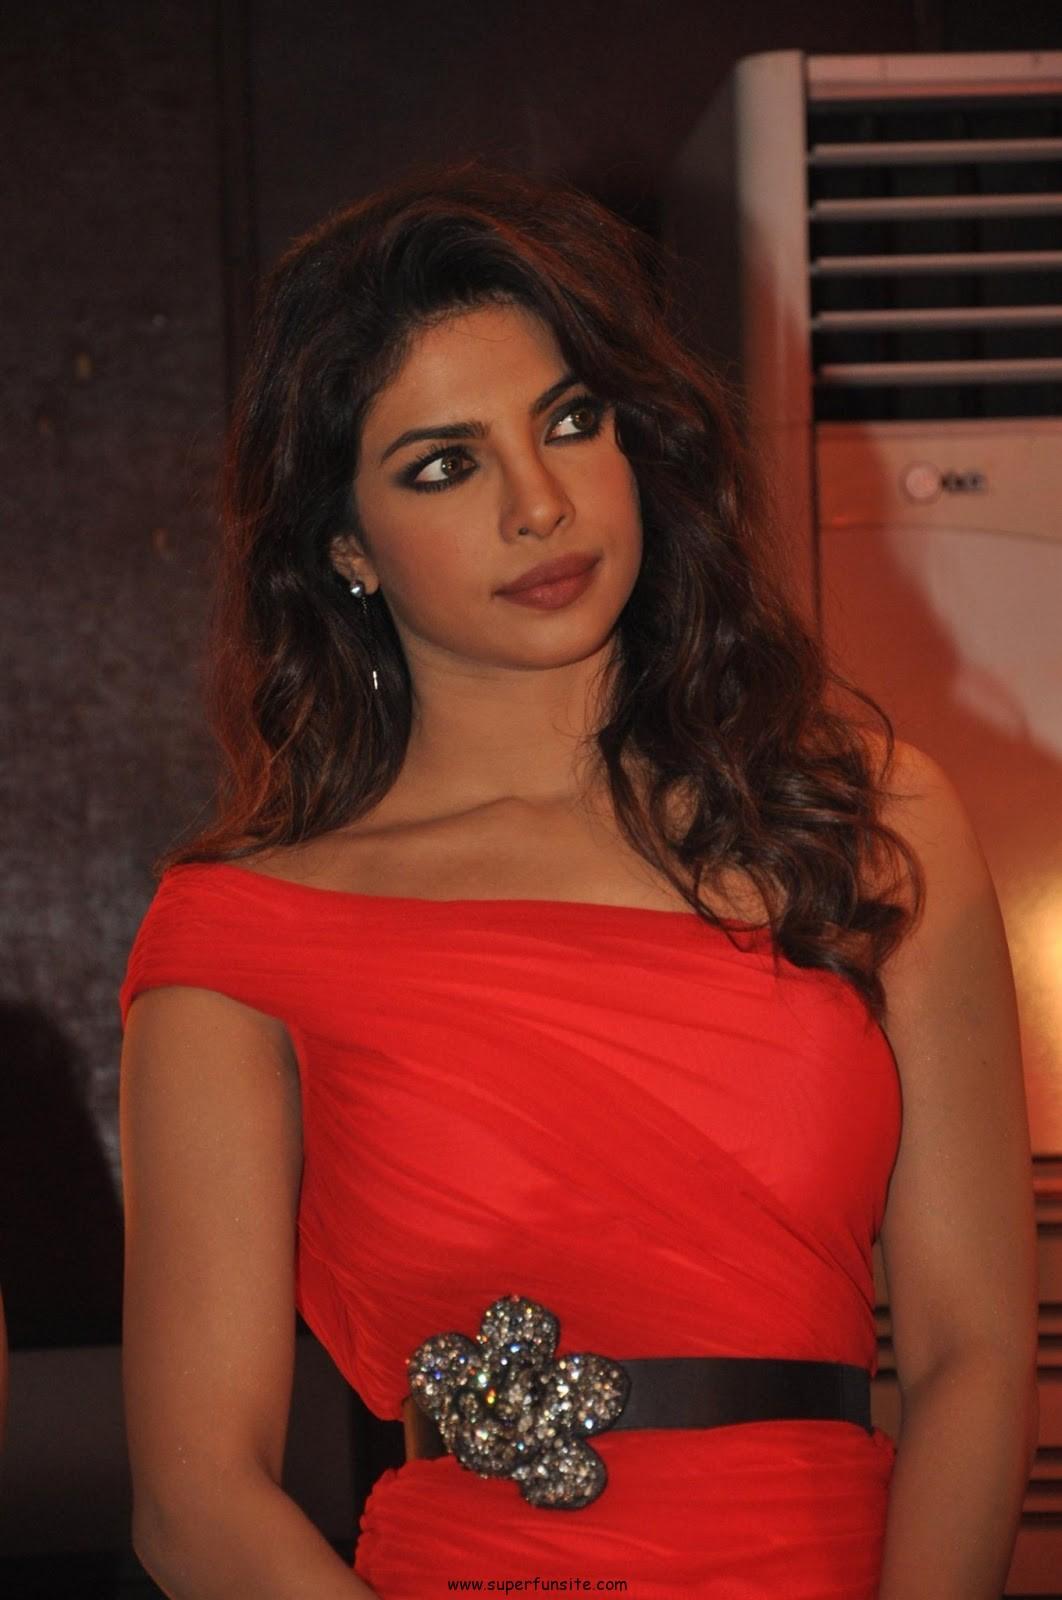 Priyanka Chopras Property Used By Spa Owner To Run A Sex Racket-7164